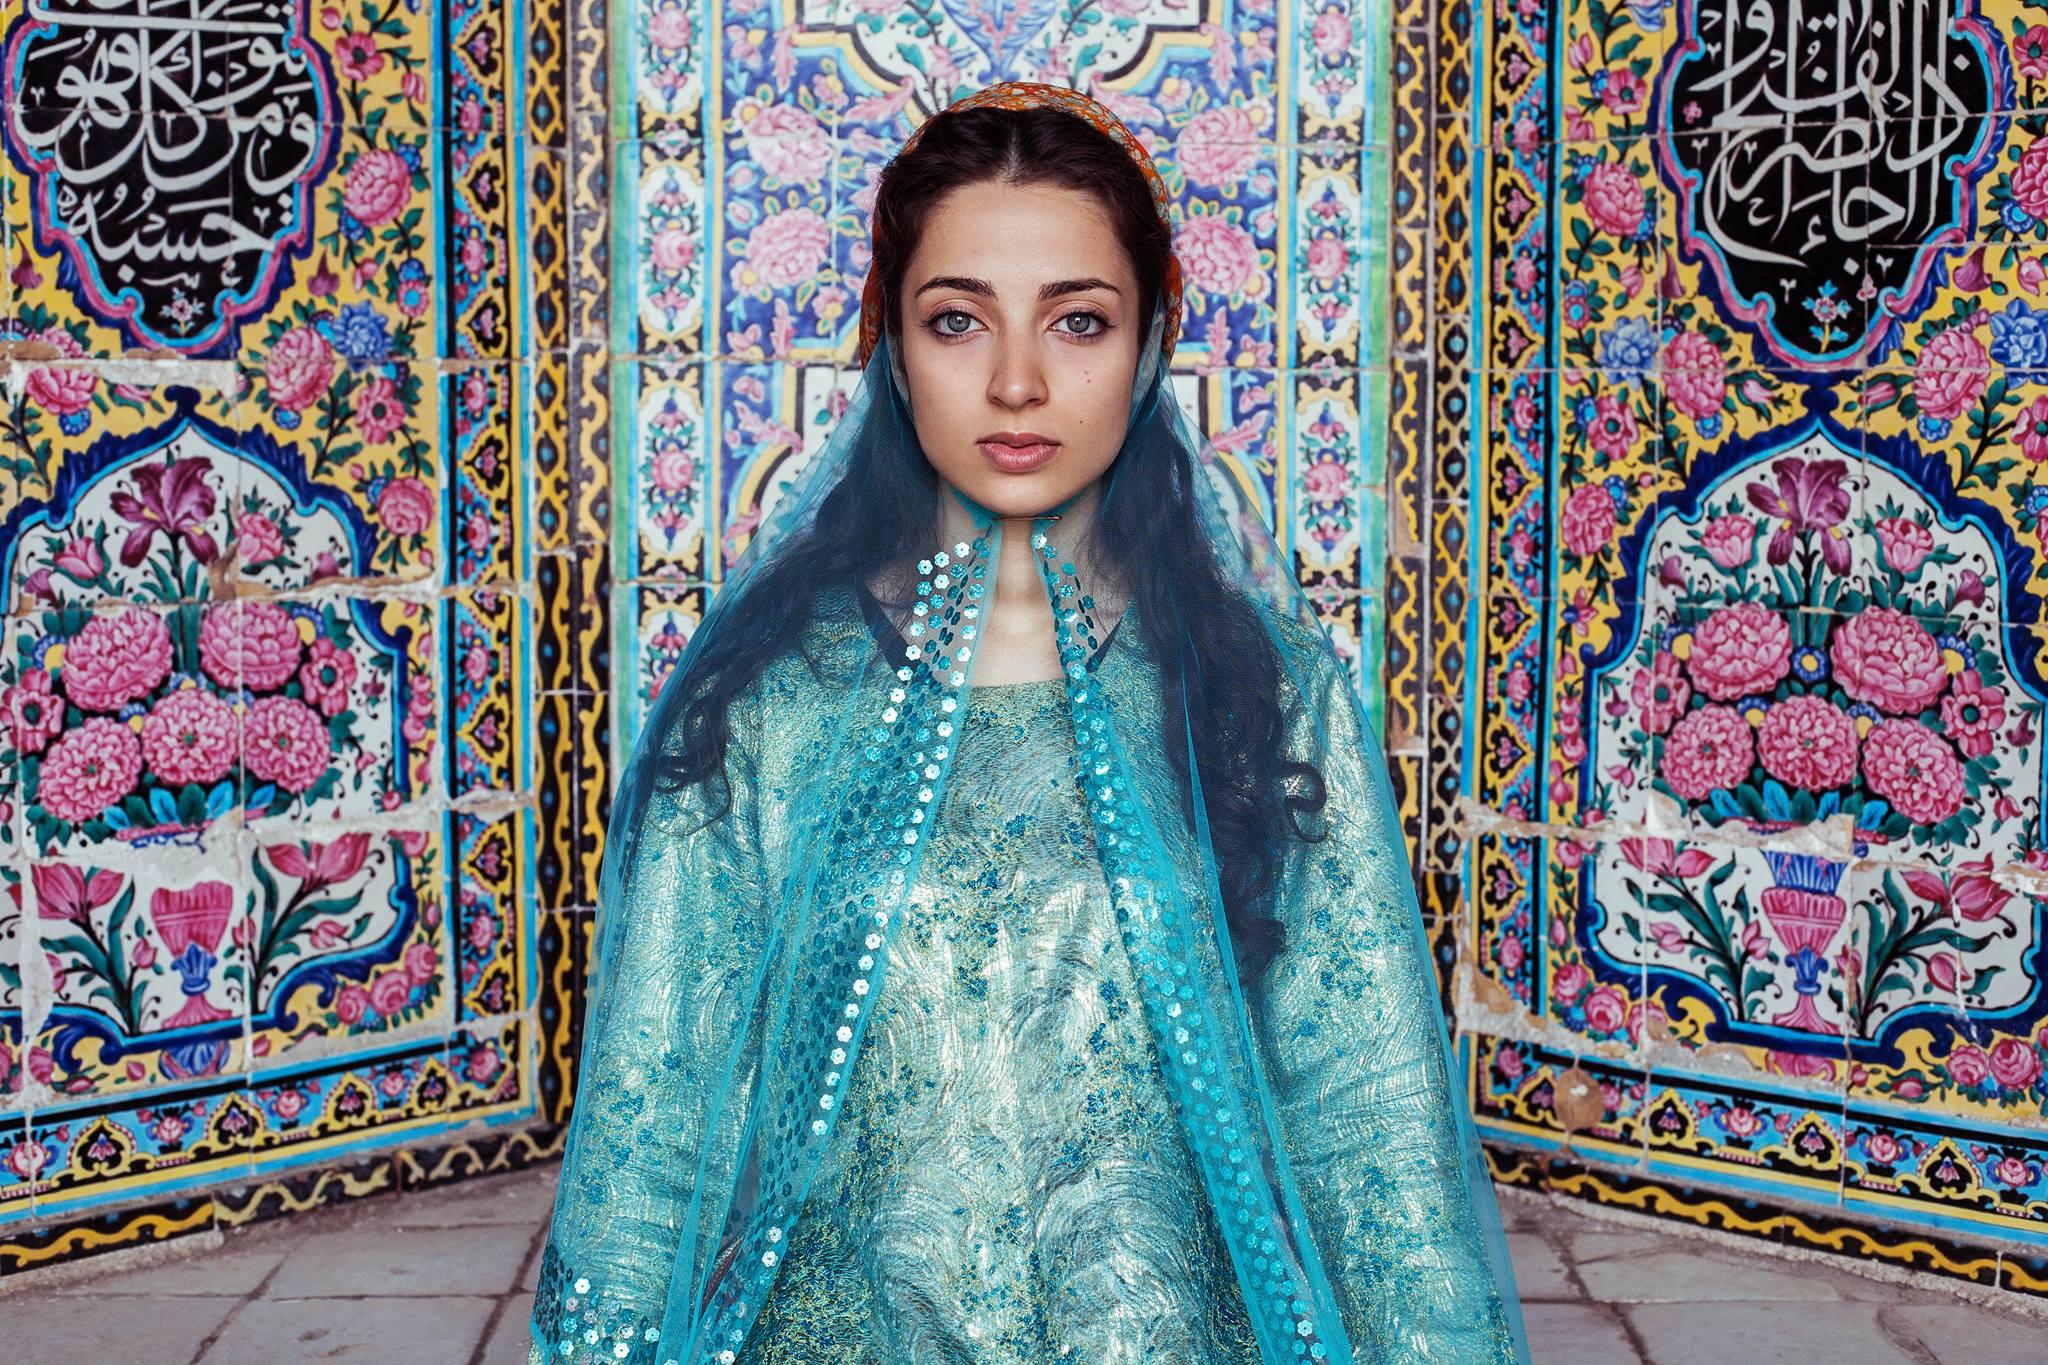 Shiraz, Iran 2